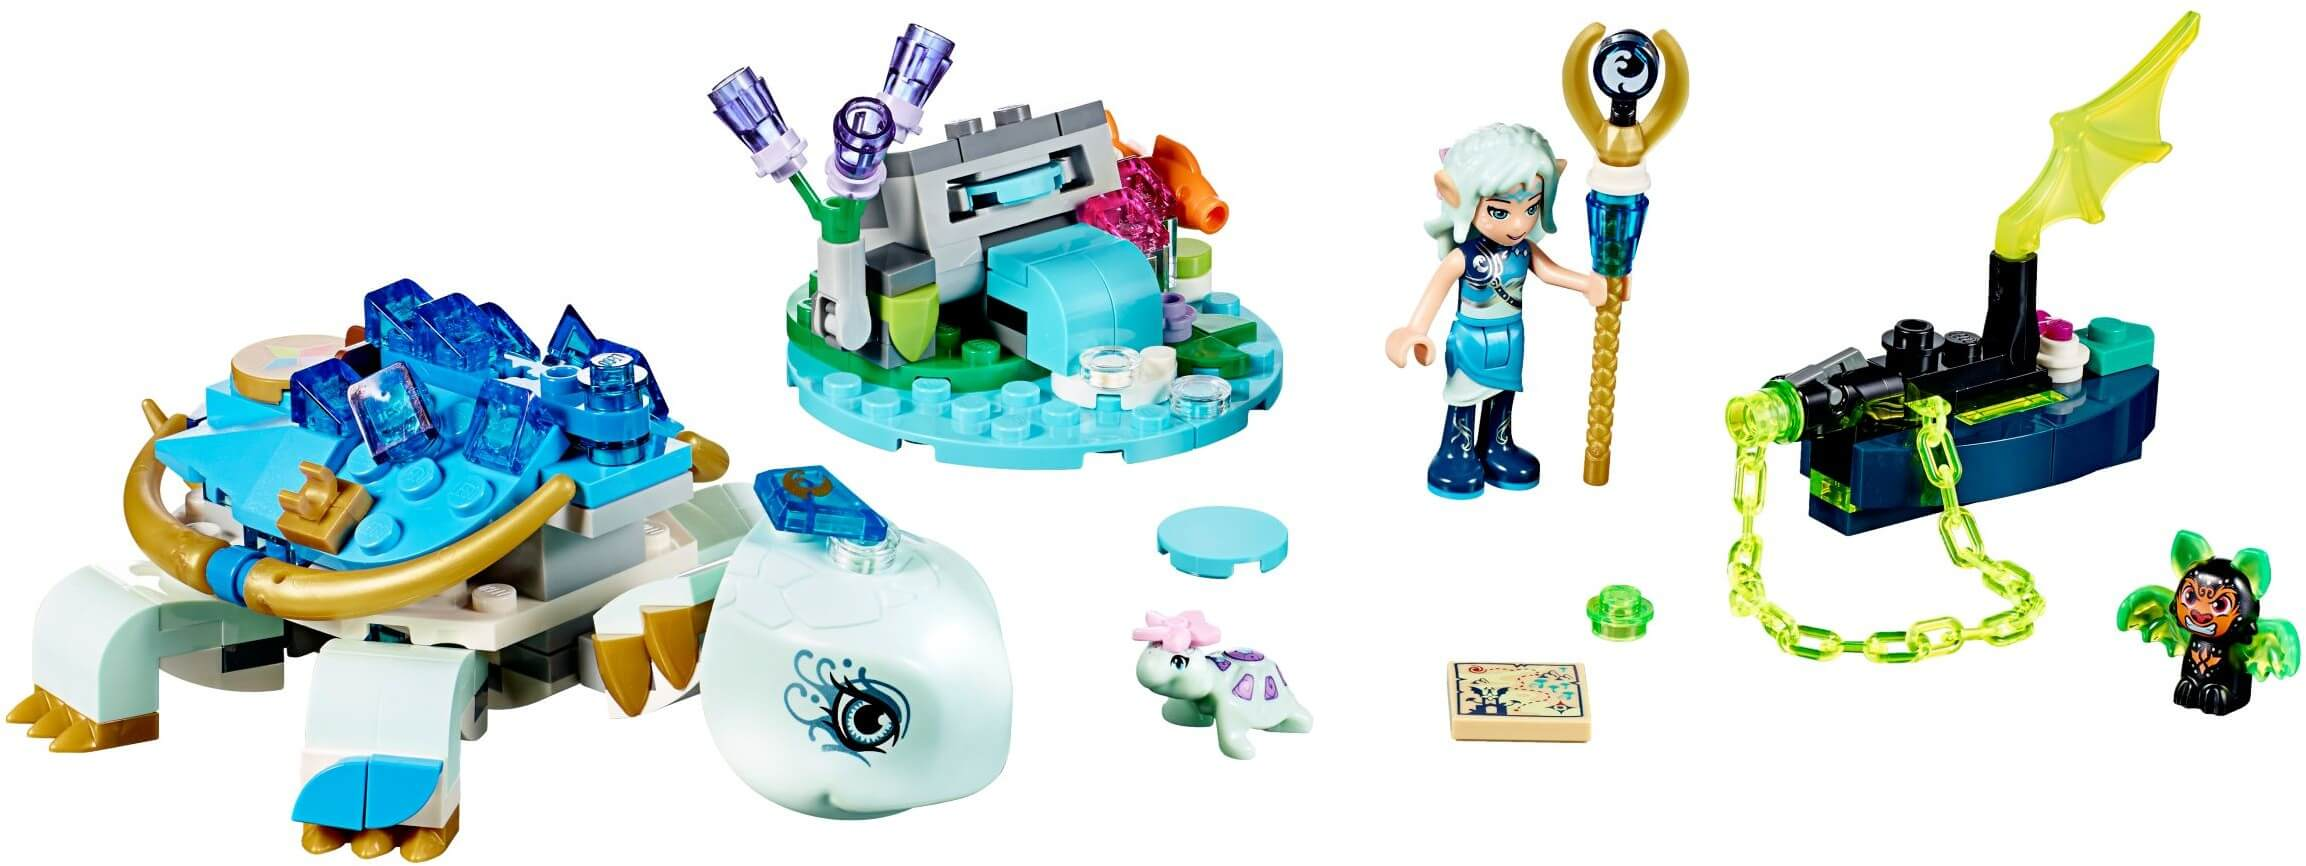 Mua đồ chơi LEGO 41191 - LEGO Elves 41191 - Rùa Nước Khổng Lồ của Naida (LEGO Elves 41191 Naida & the Water Turtle Ambush)